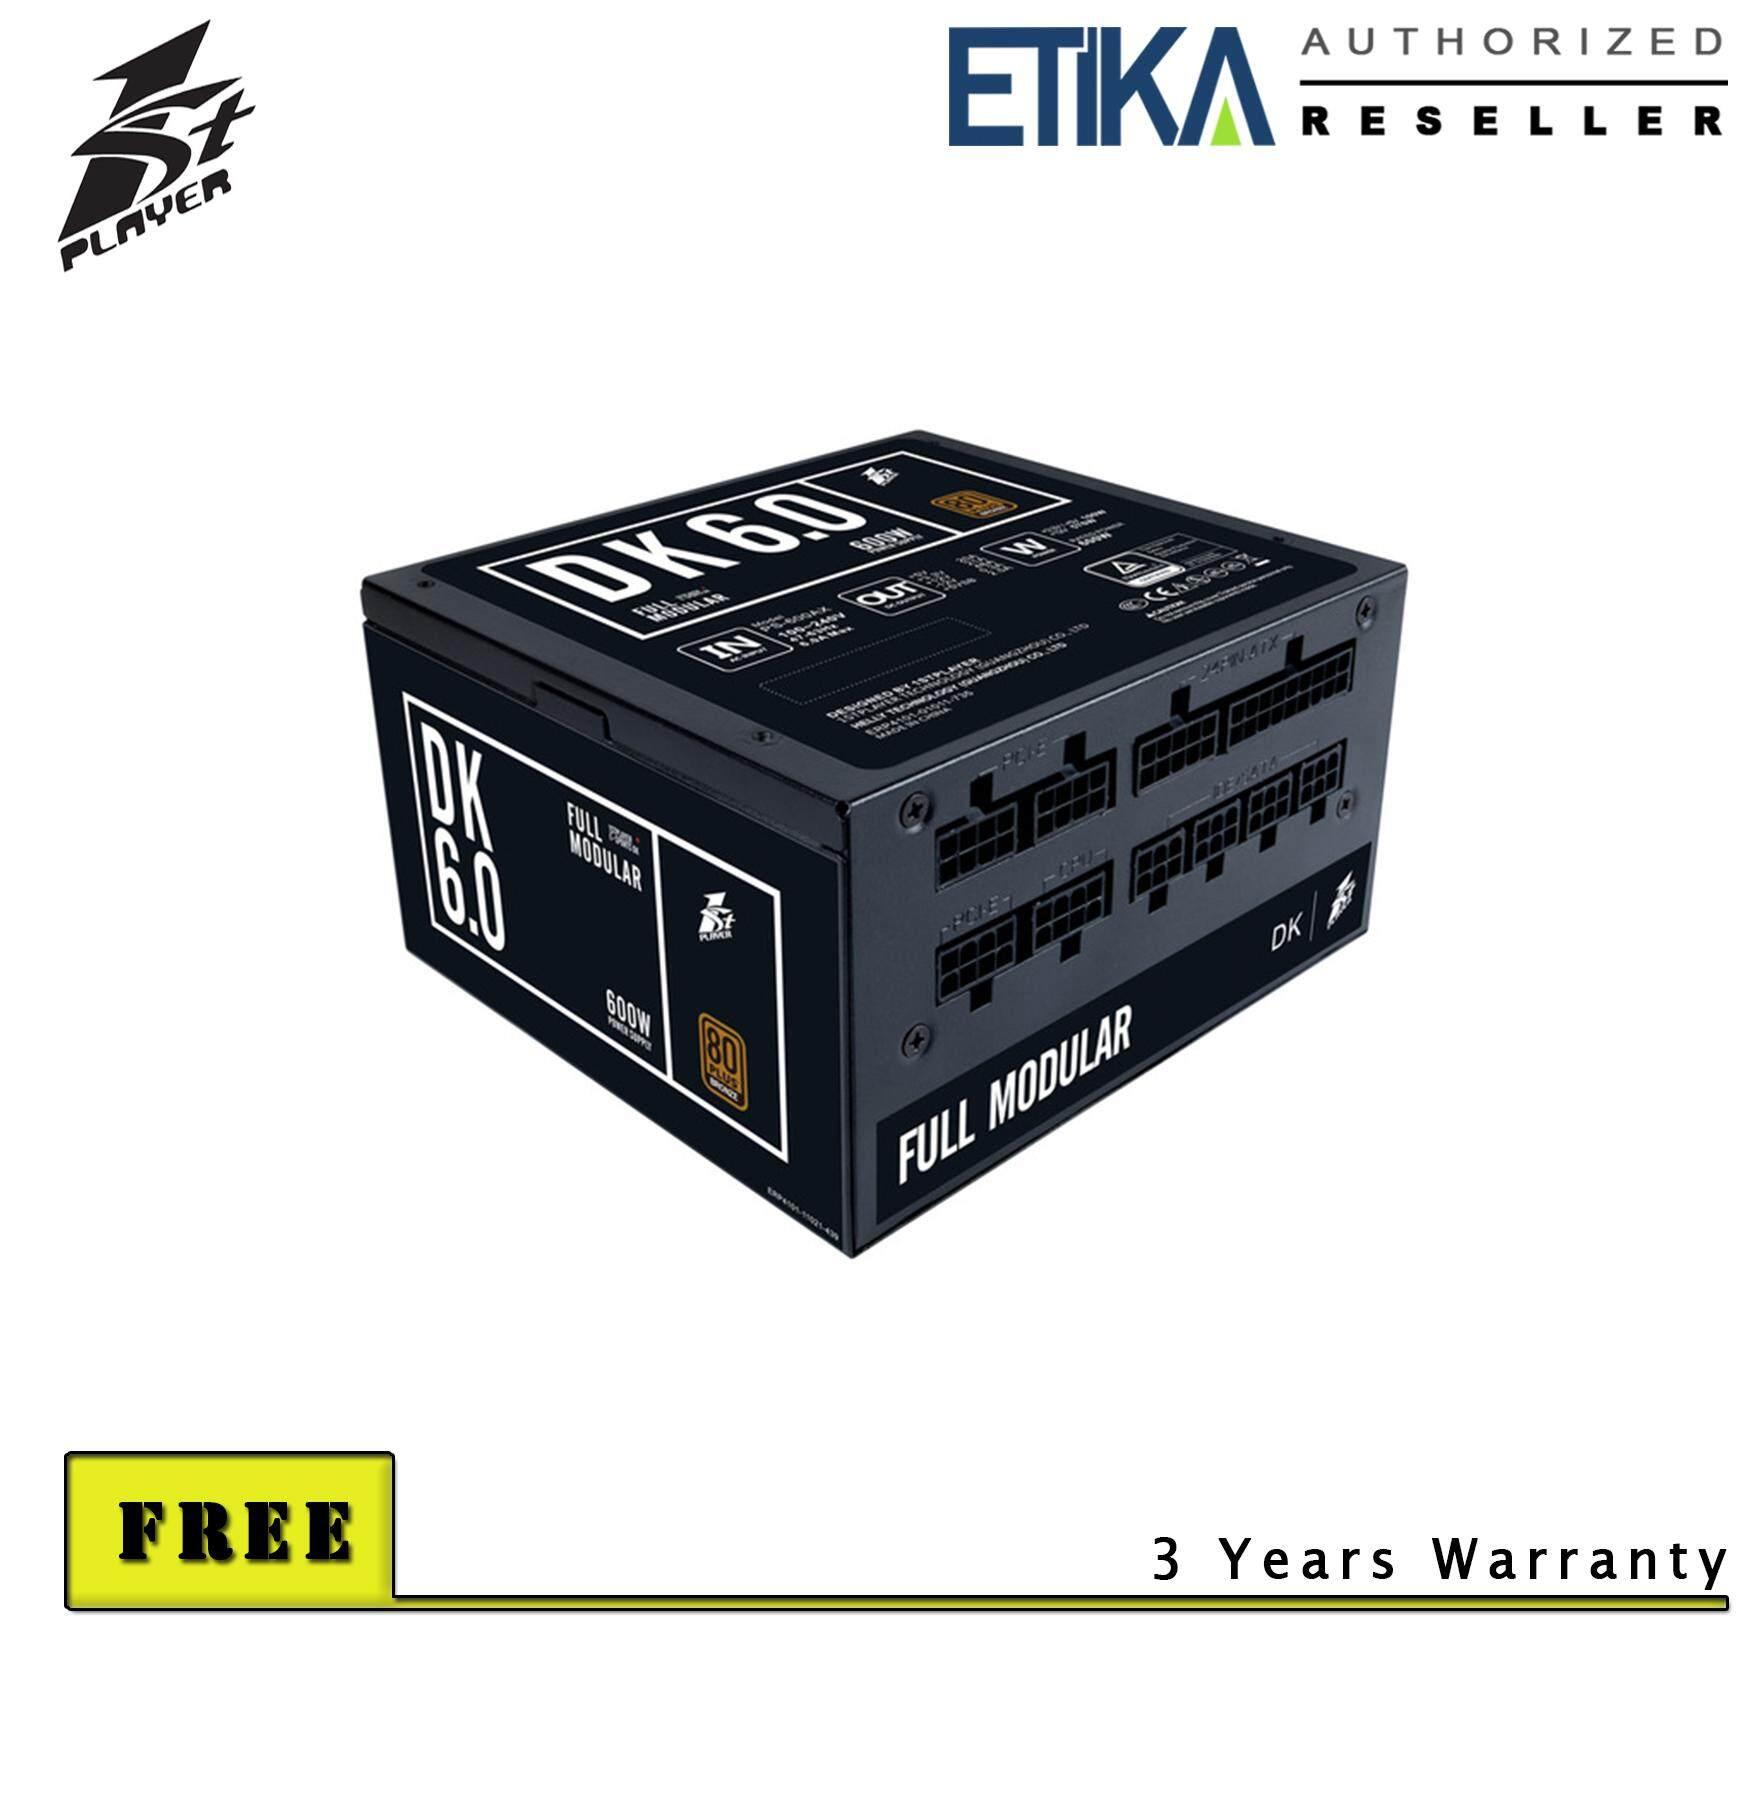 1st Player Dk6.0 600w 80+ Bronze Full Modular Power Supply (3 Years Warranty) By Etika Komputer S/b.